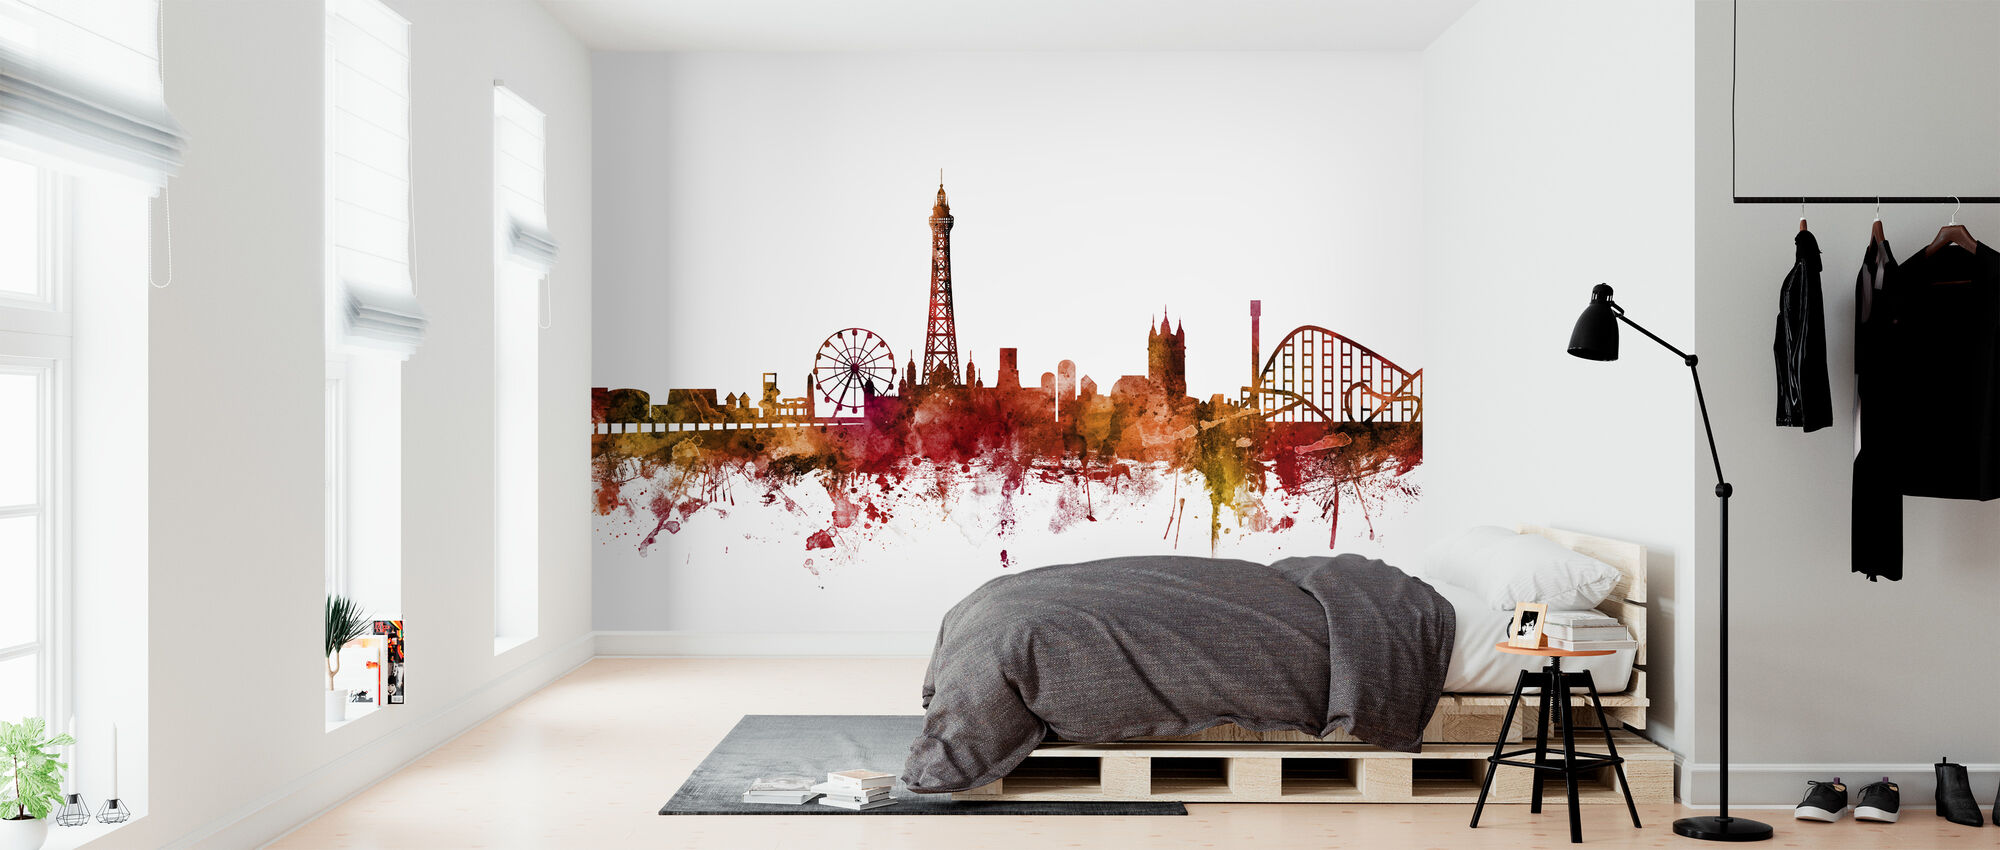 Blackpool England Skyline - Wallpaper - Bedroom